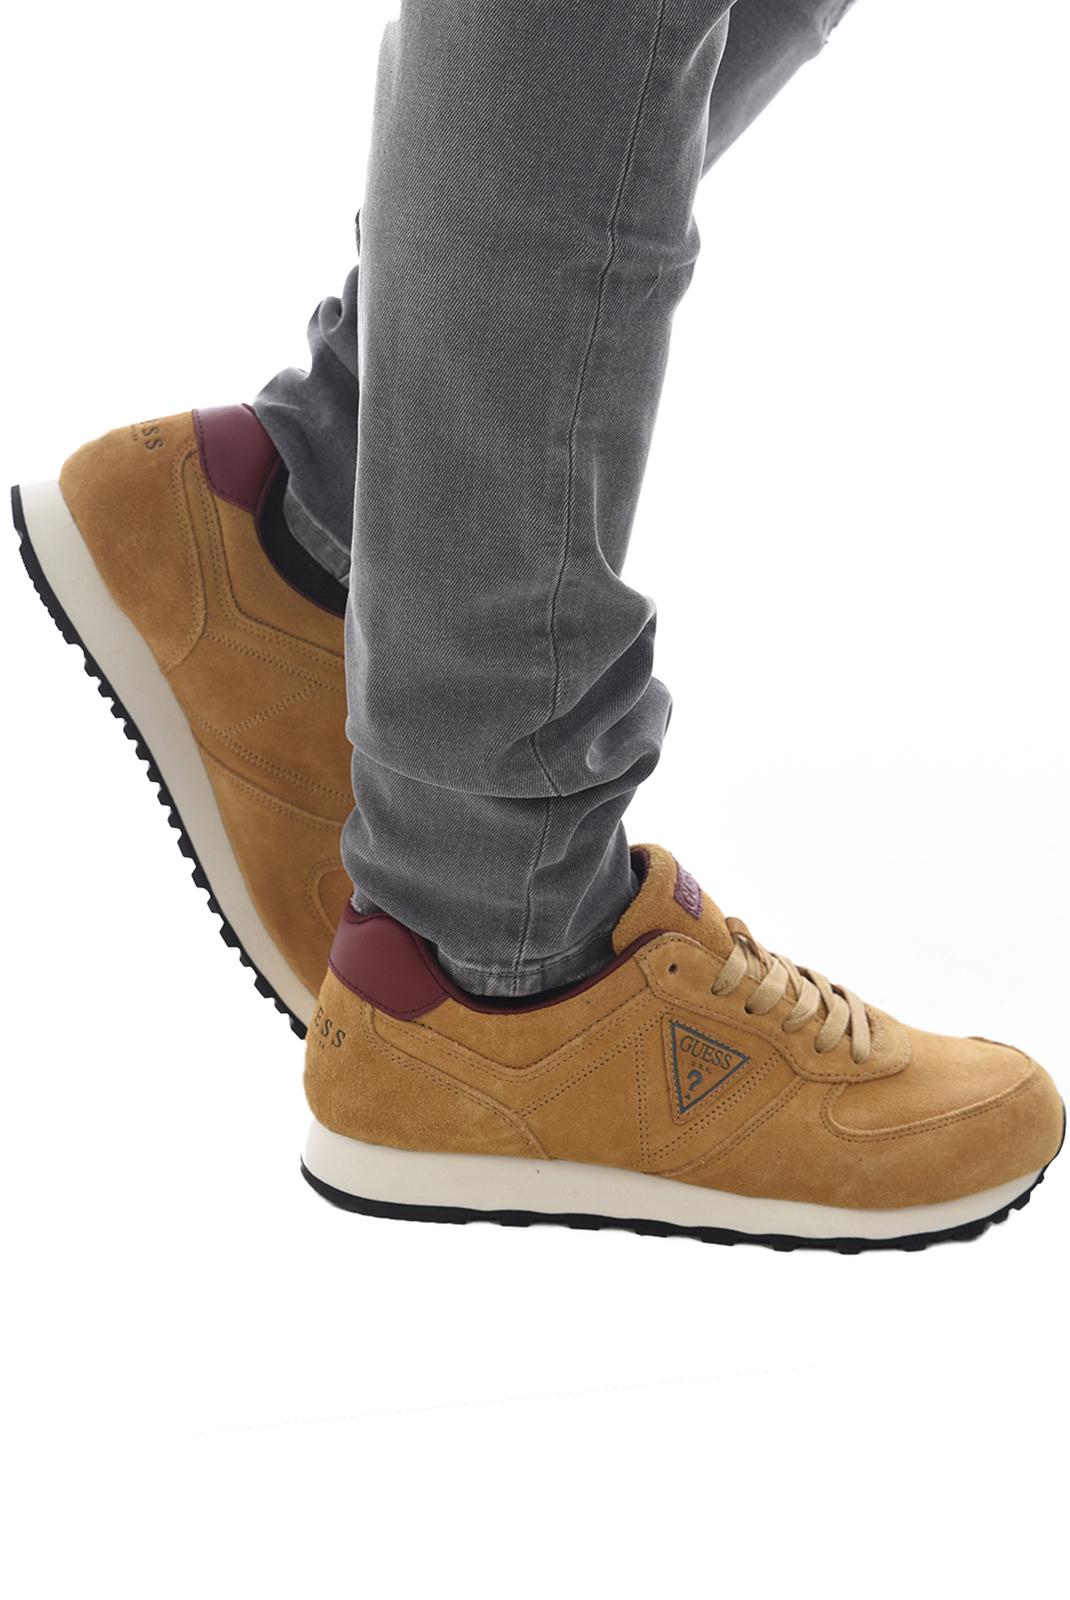 Baskets / Sport  Guess jeans FMCRL3 SUE12 BEIGE